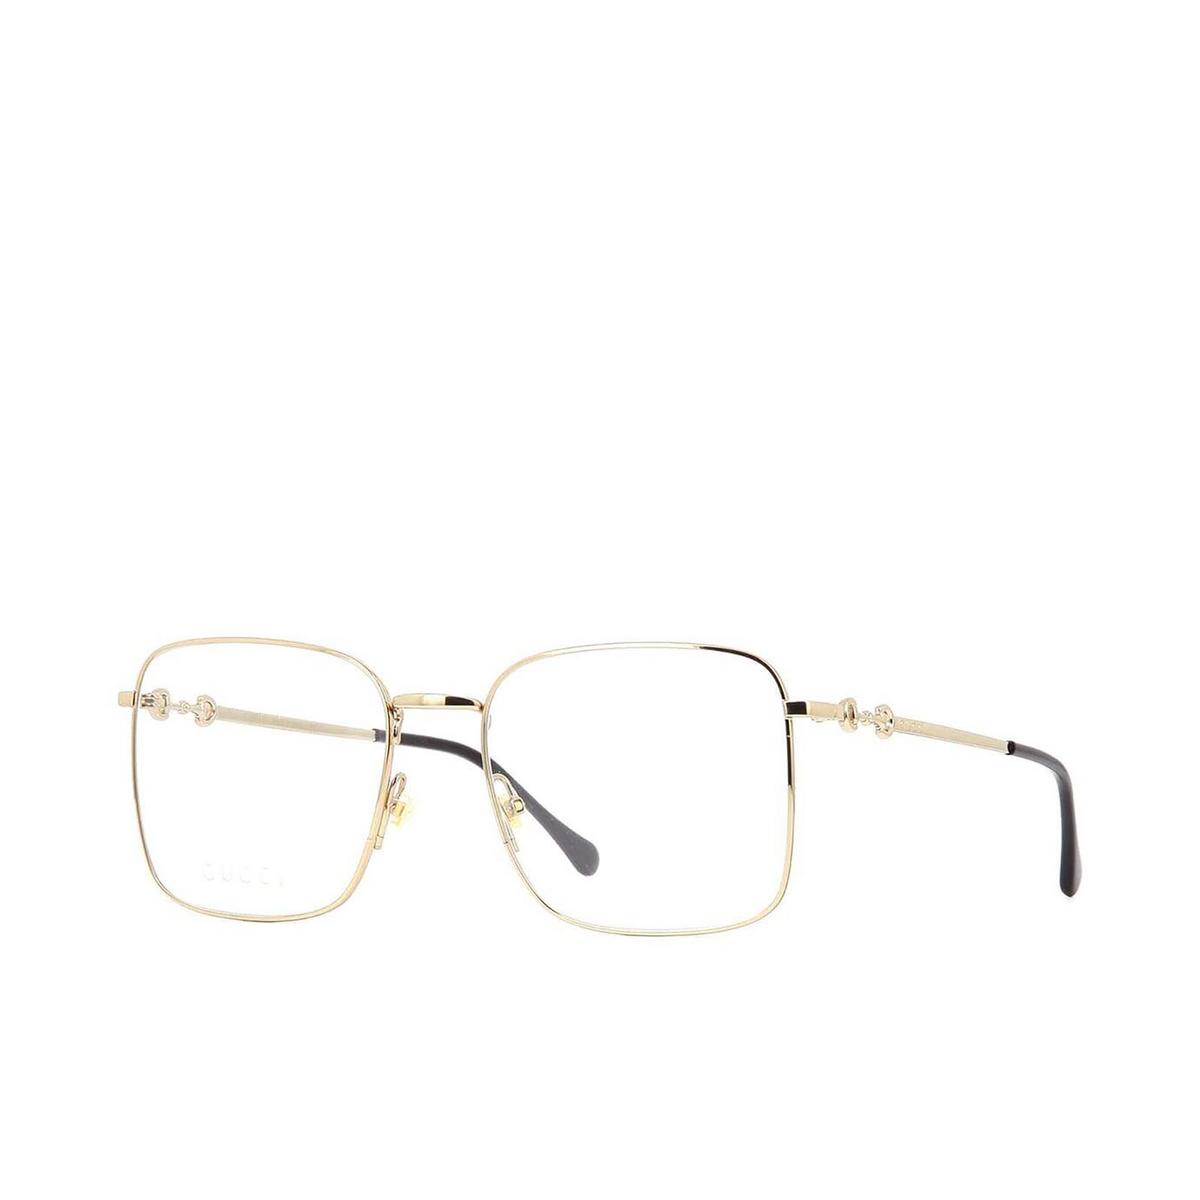 Gucci® Square Eyeglasses: GG0951O color Gold 002 - three-quarters view.